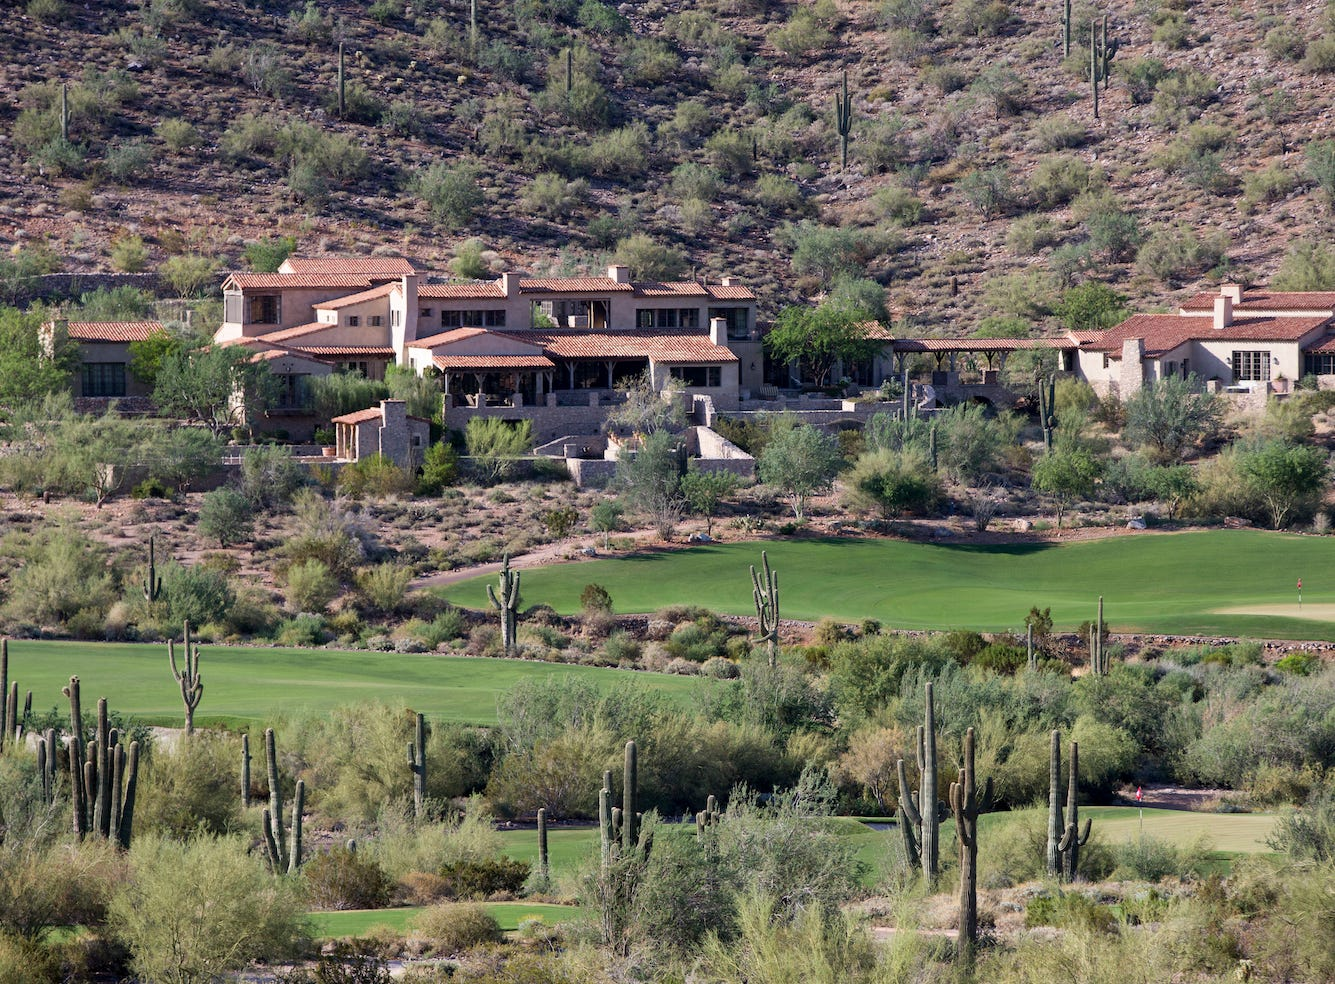 85266/north Scottsdale - $700,000 to $687,000 – down 2%